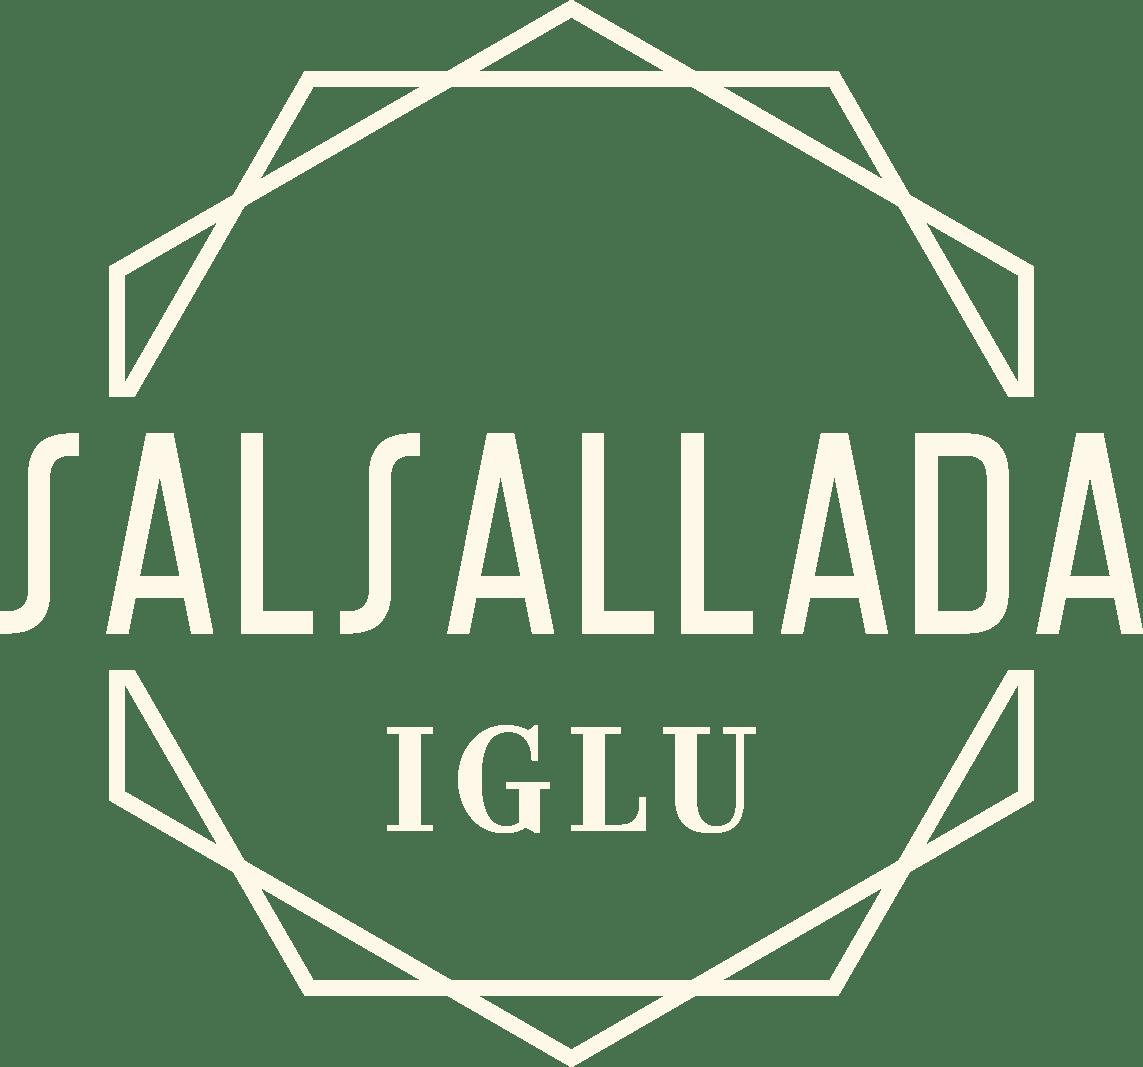 Salsallada Iglu